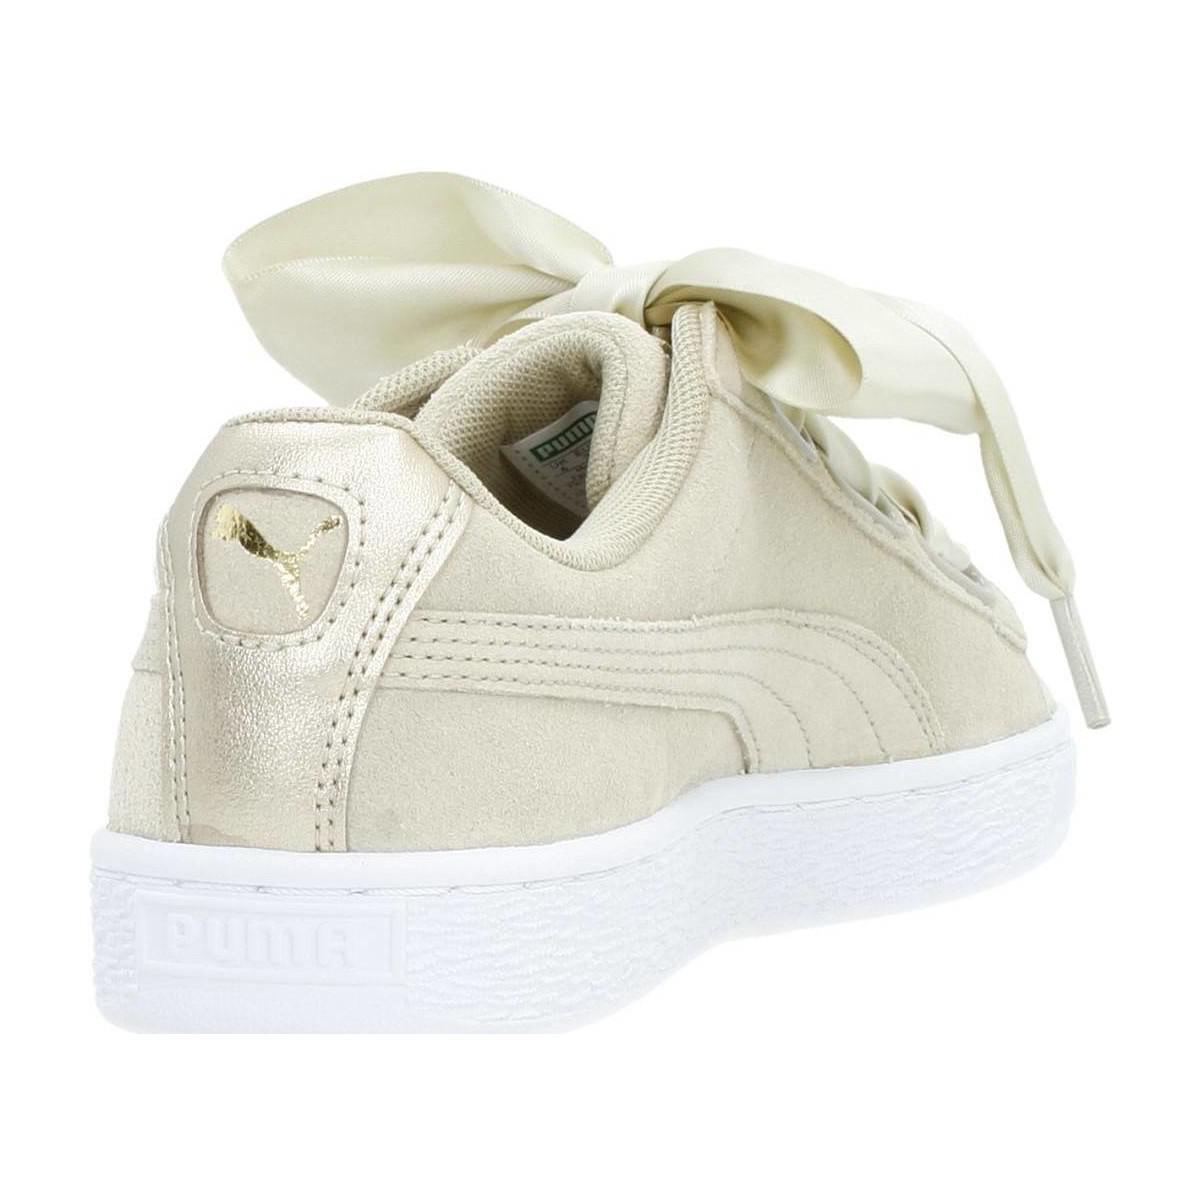 2dc876b9057 PUMA Suede Heart Safari Wn 039 s Women s Shoes (trainers) In Beige ...